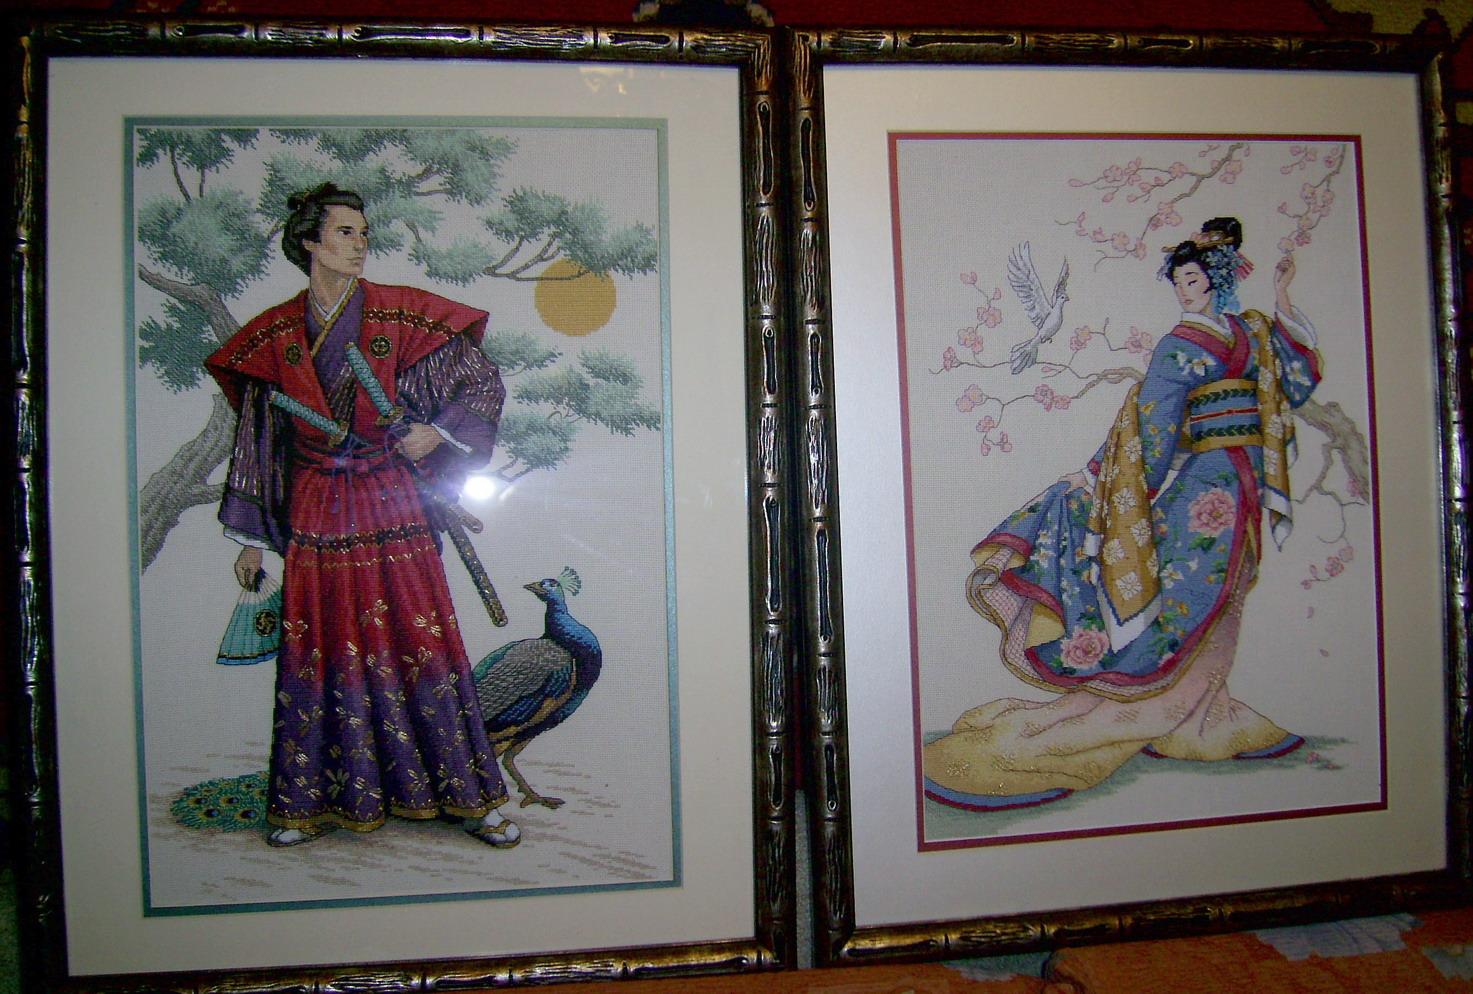 The Mighty Samurai и Elegance of the Orien (Dim). Портреты